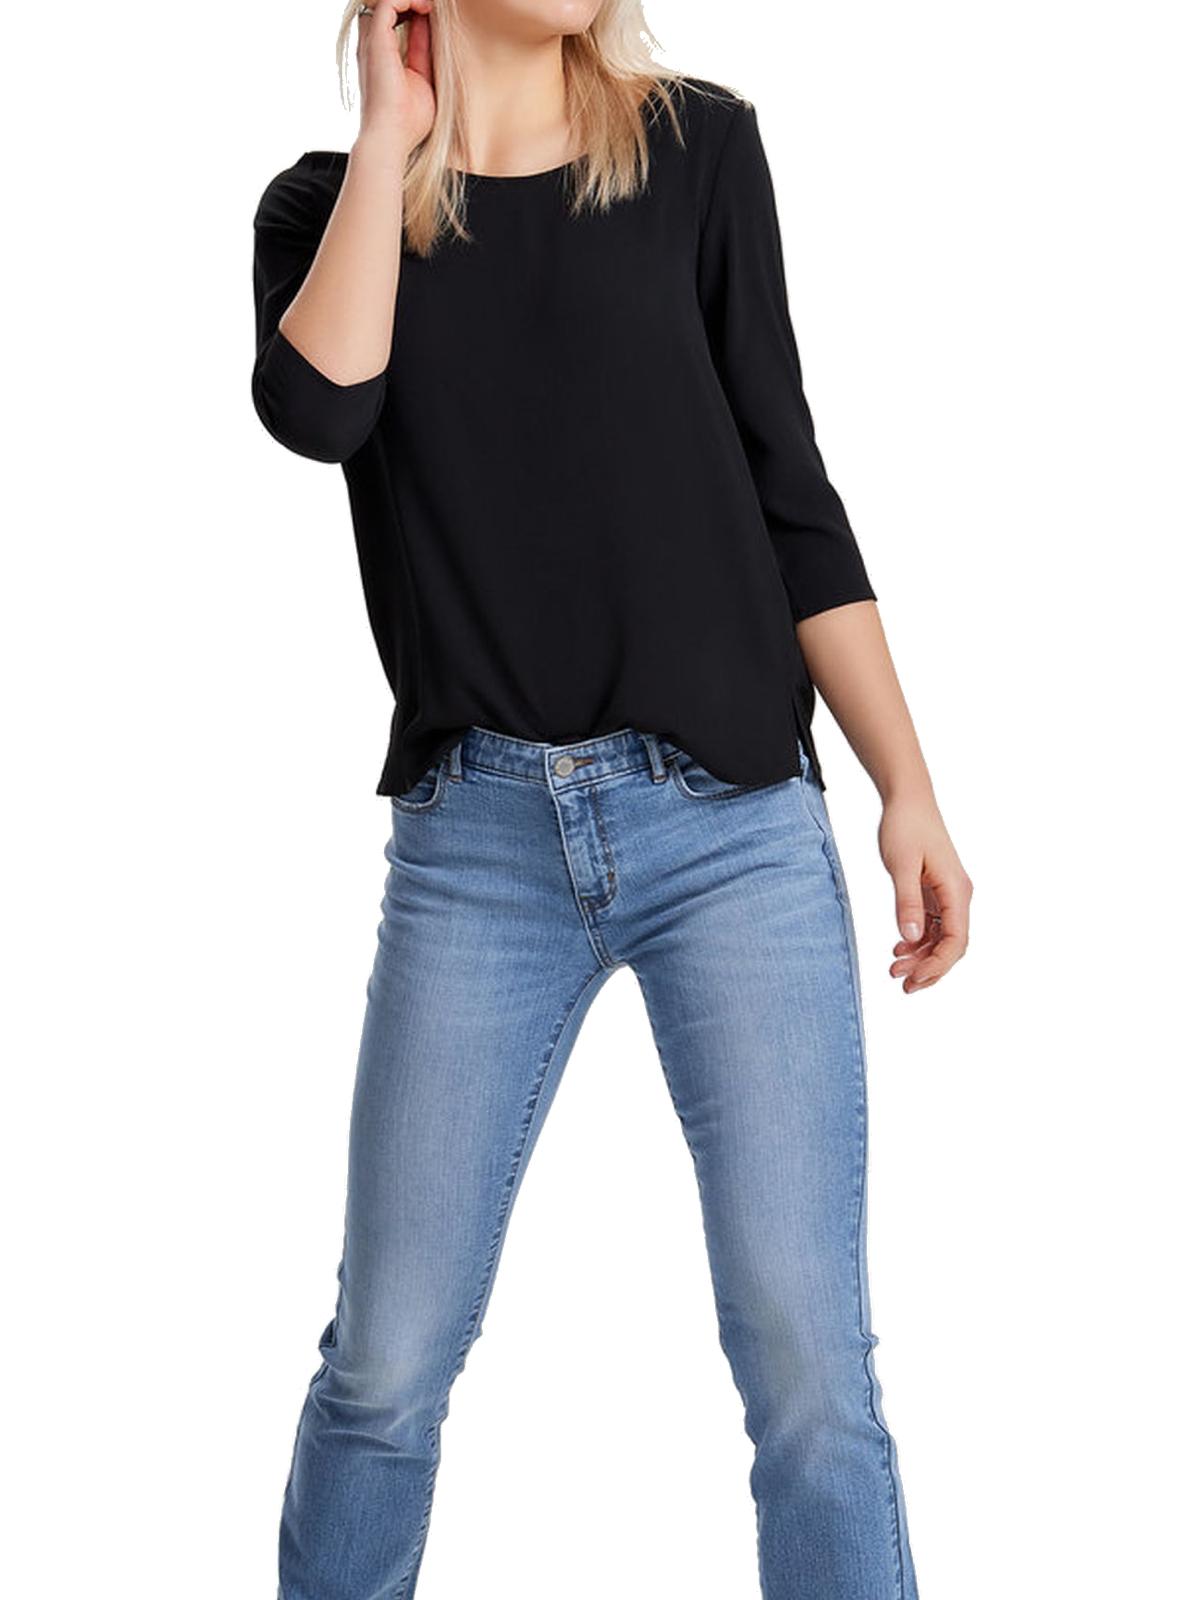 only damen t shirt onlvic 3 4 marken designer bluse party abend top neu ebay. Black Bedroom Furniture Sets. Home Design Ideas